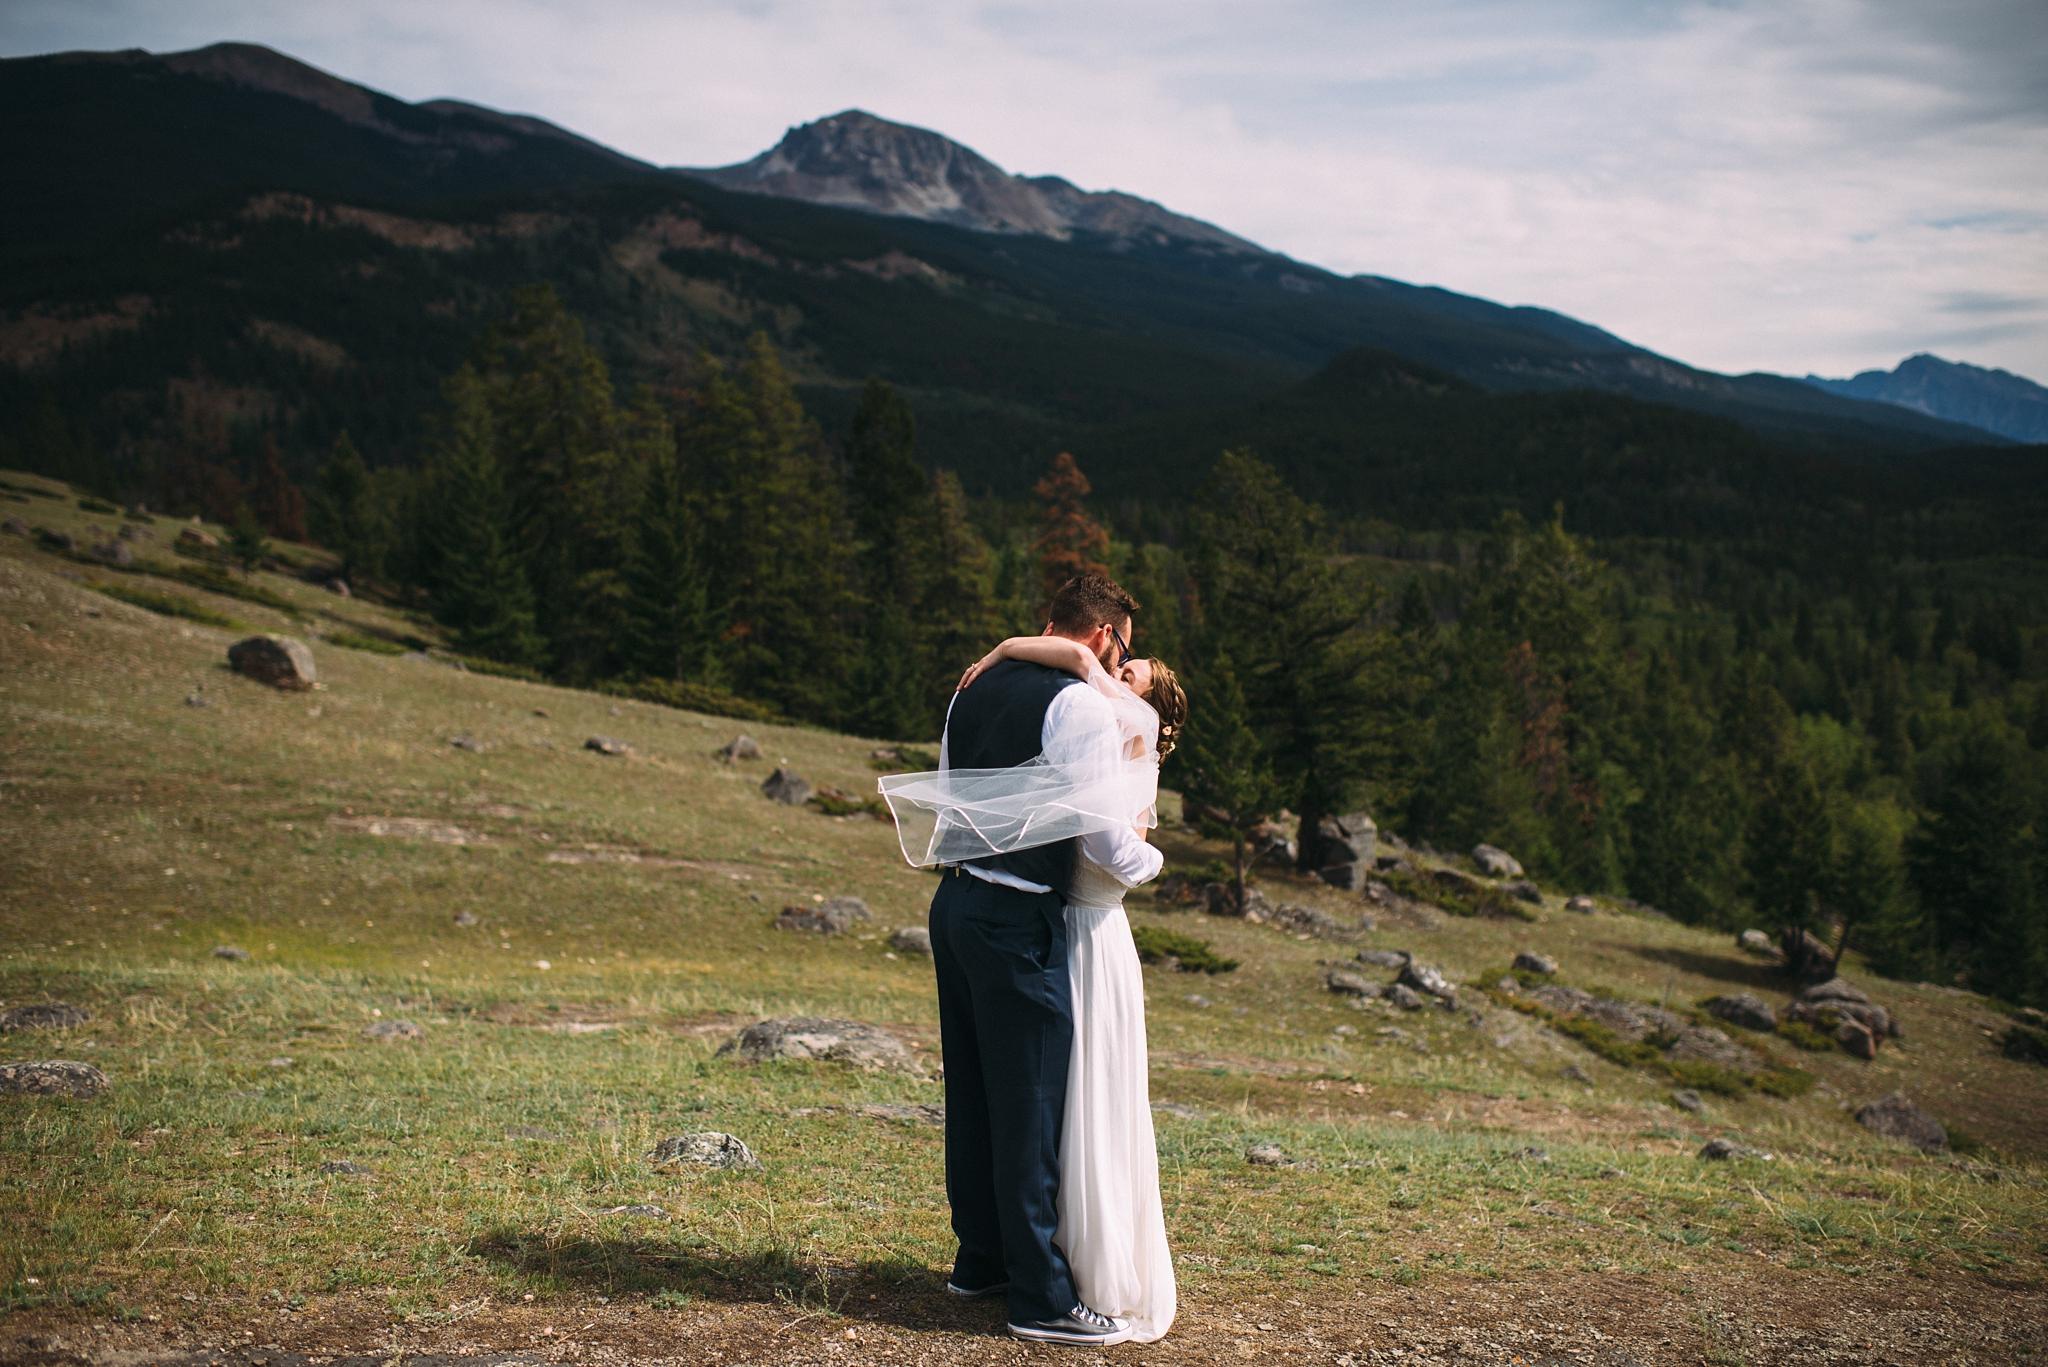 kaihla_tonai_intimate_wedding_elopement_photographer_2473